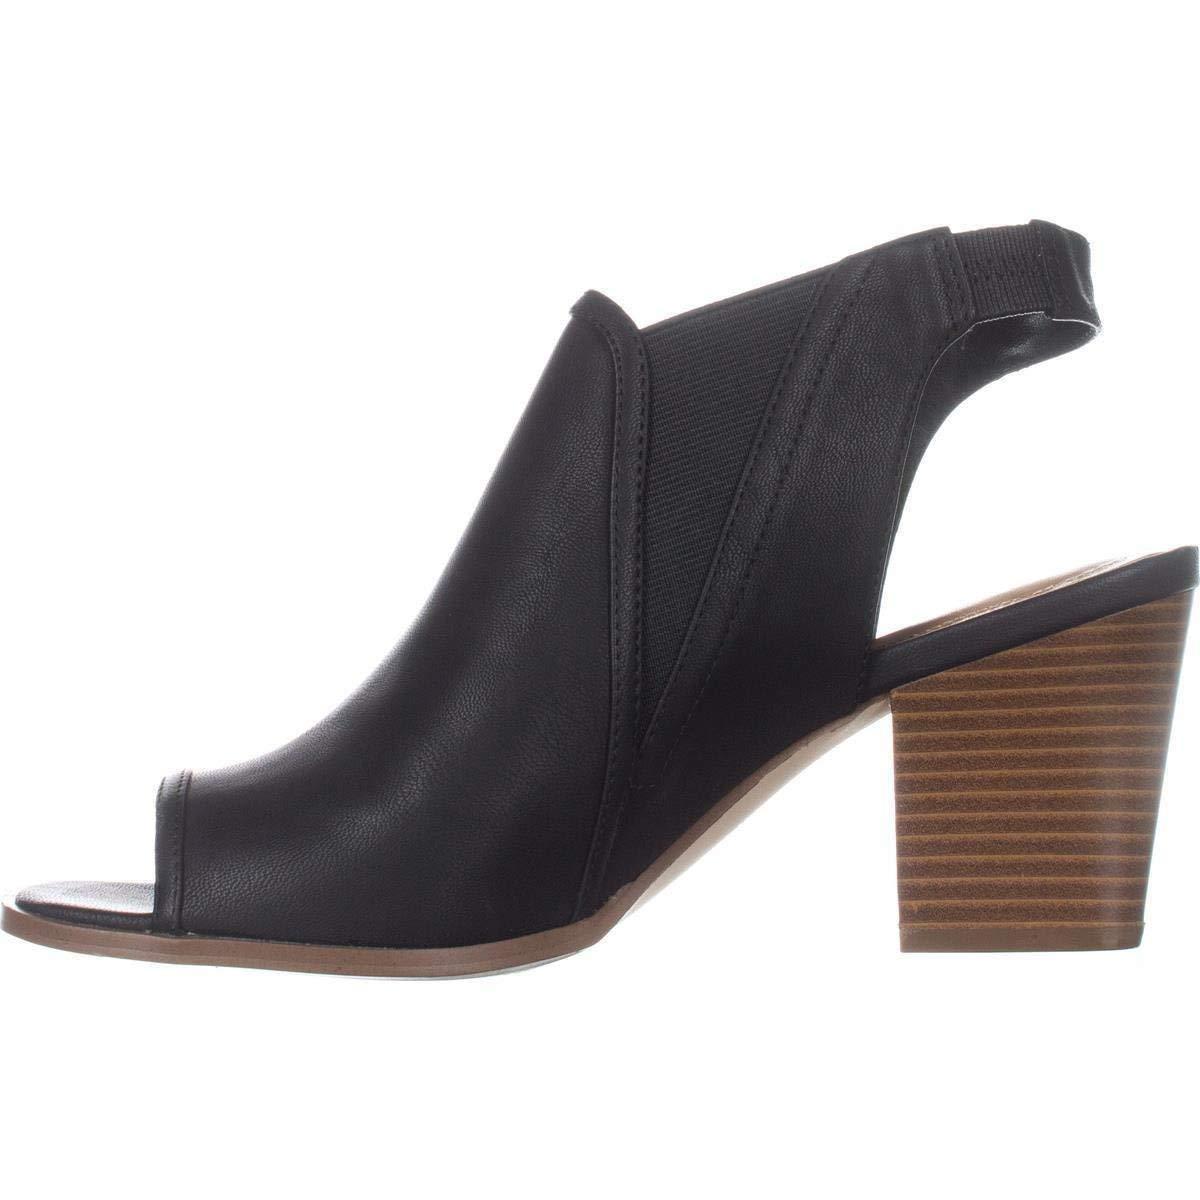 f030c2baa988 Style   Co. Womens Daniilop Peep Toe Casual Slingback Sandals